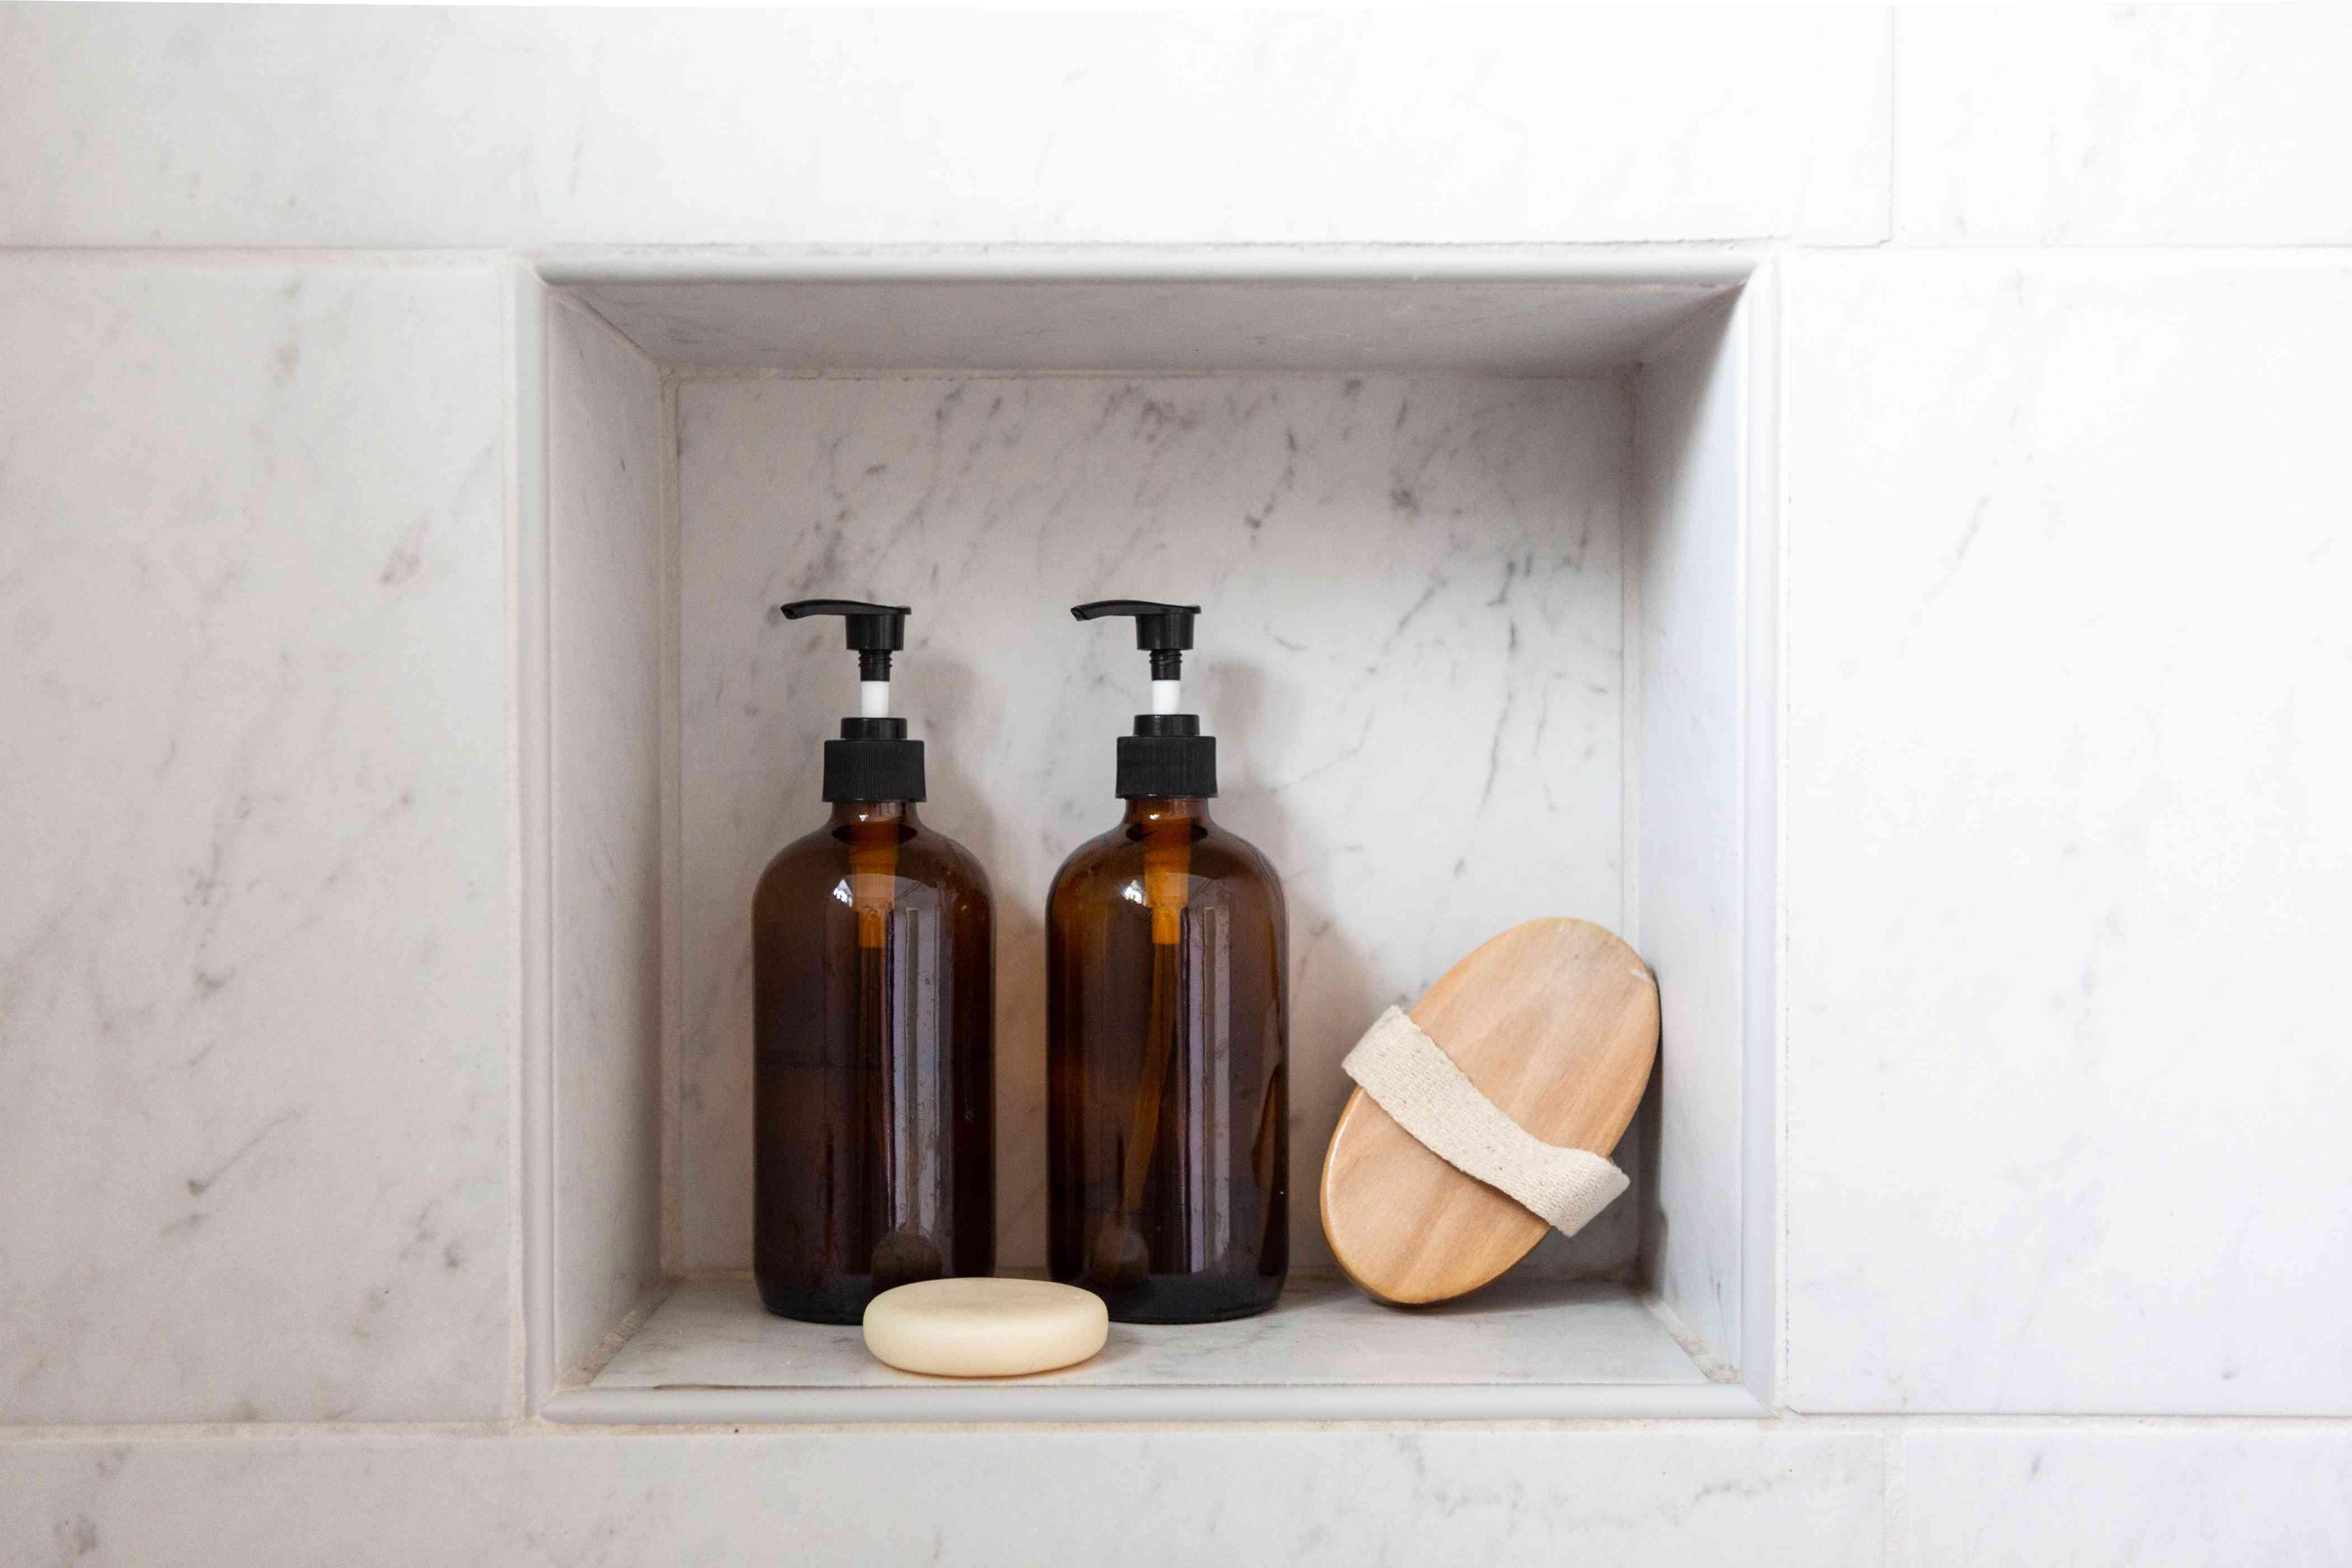 Amber DIY shampoo bottles